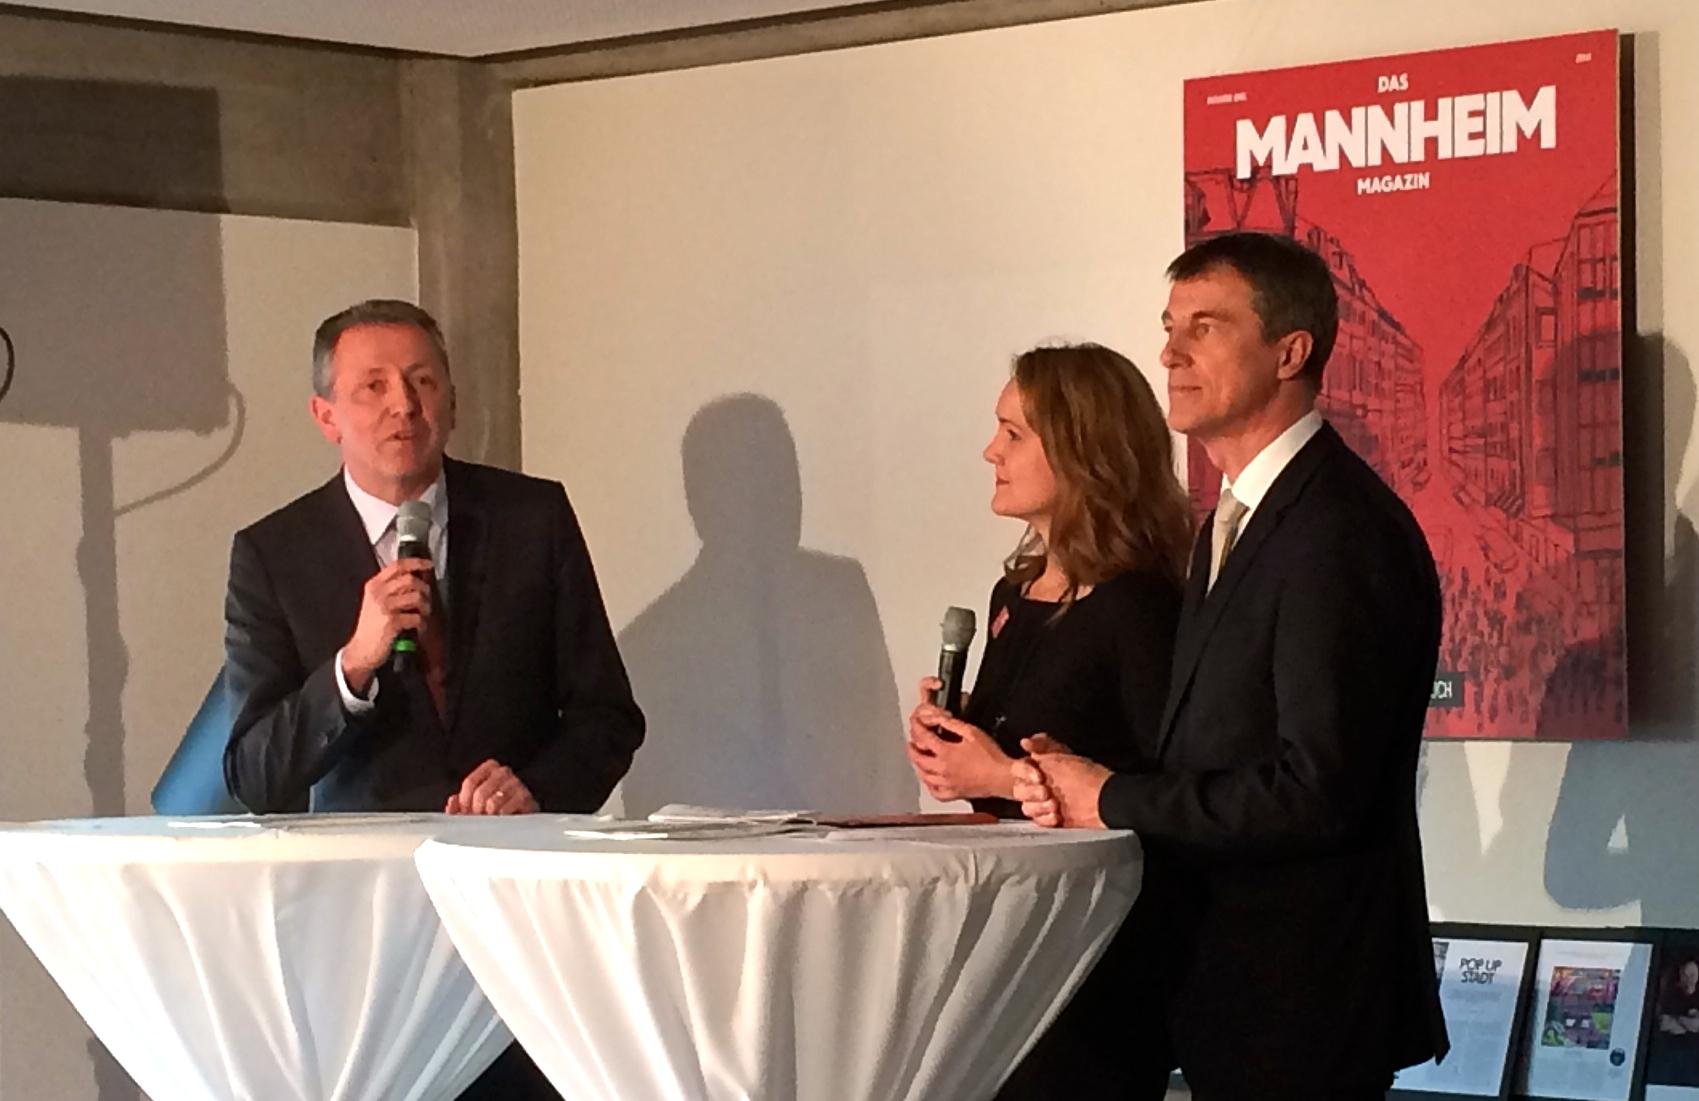 Die Review Der Preview Das Mannheim Magazin 25 Frames